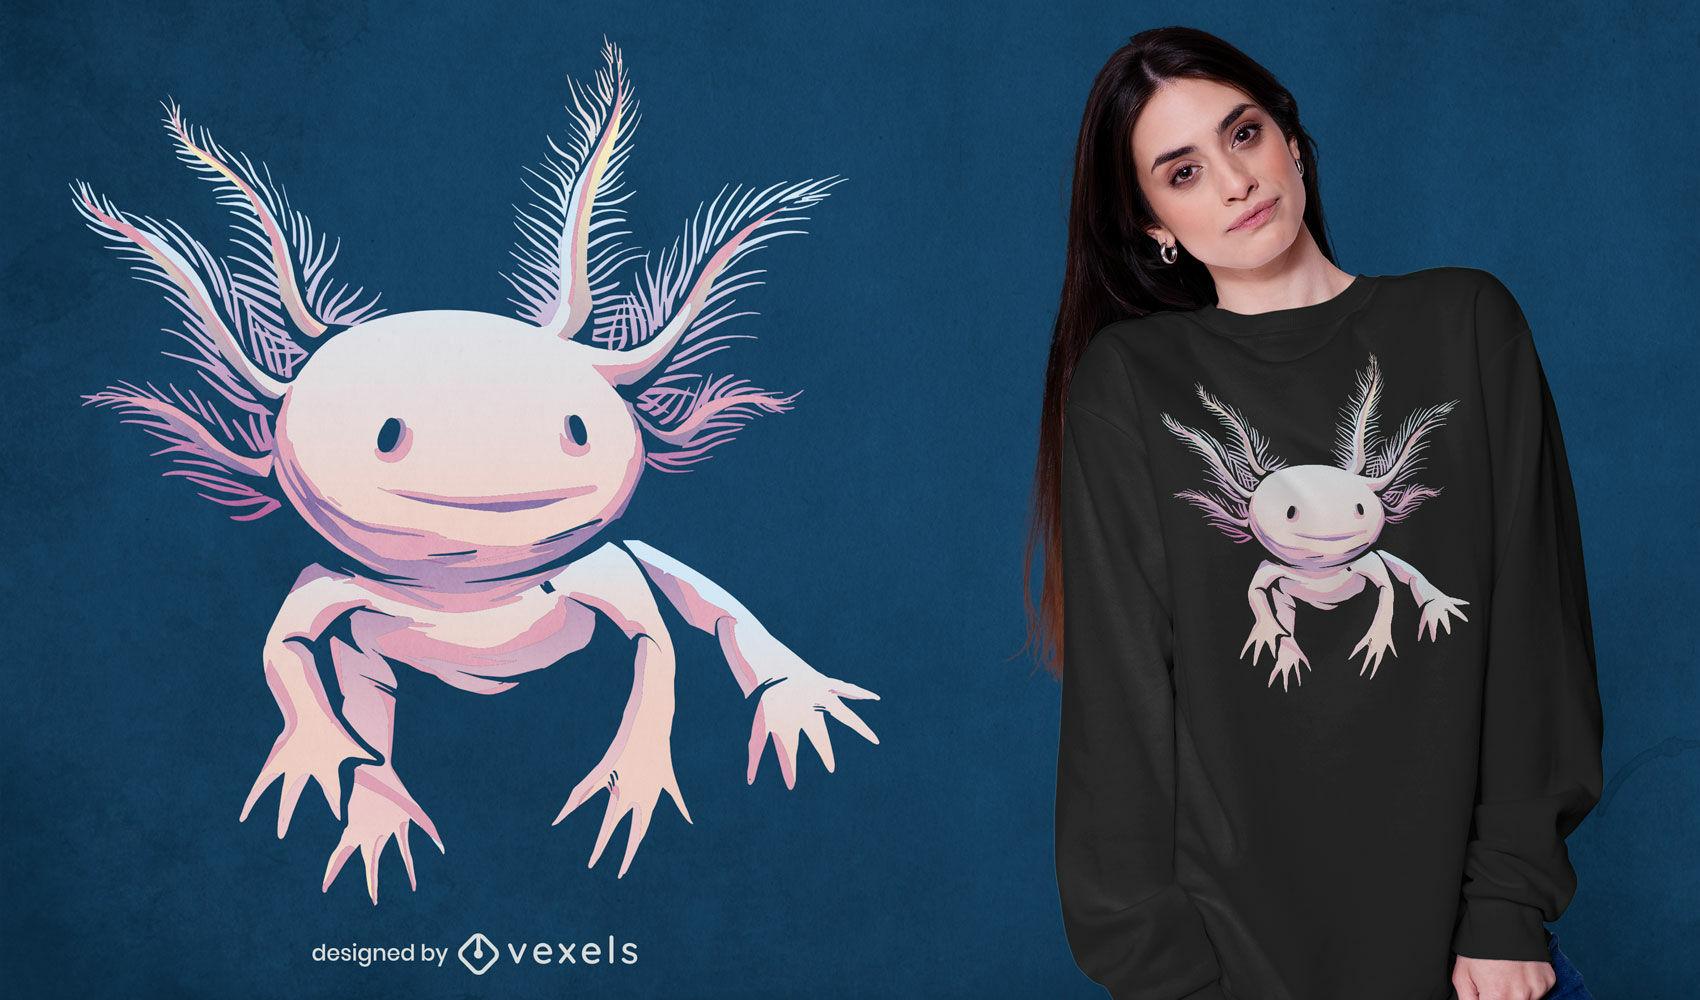 Realistic axolotl animal t-shirt design